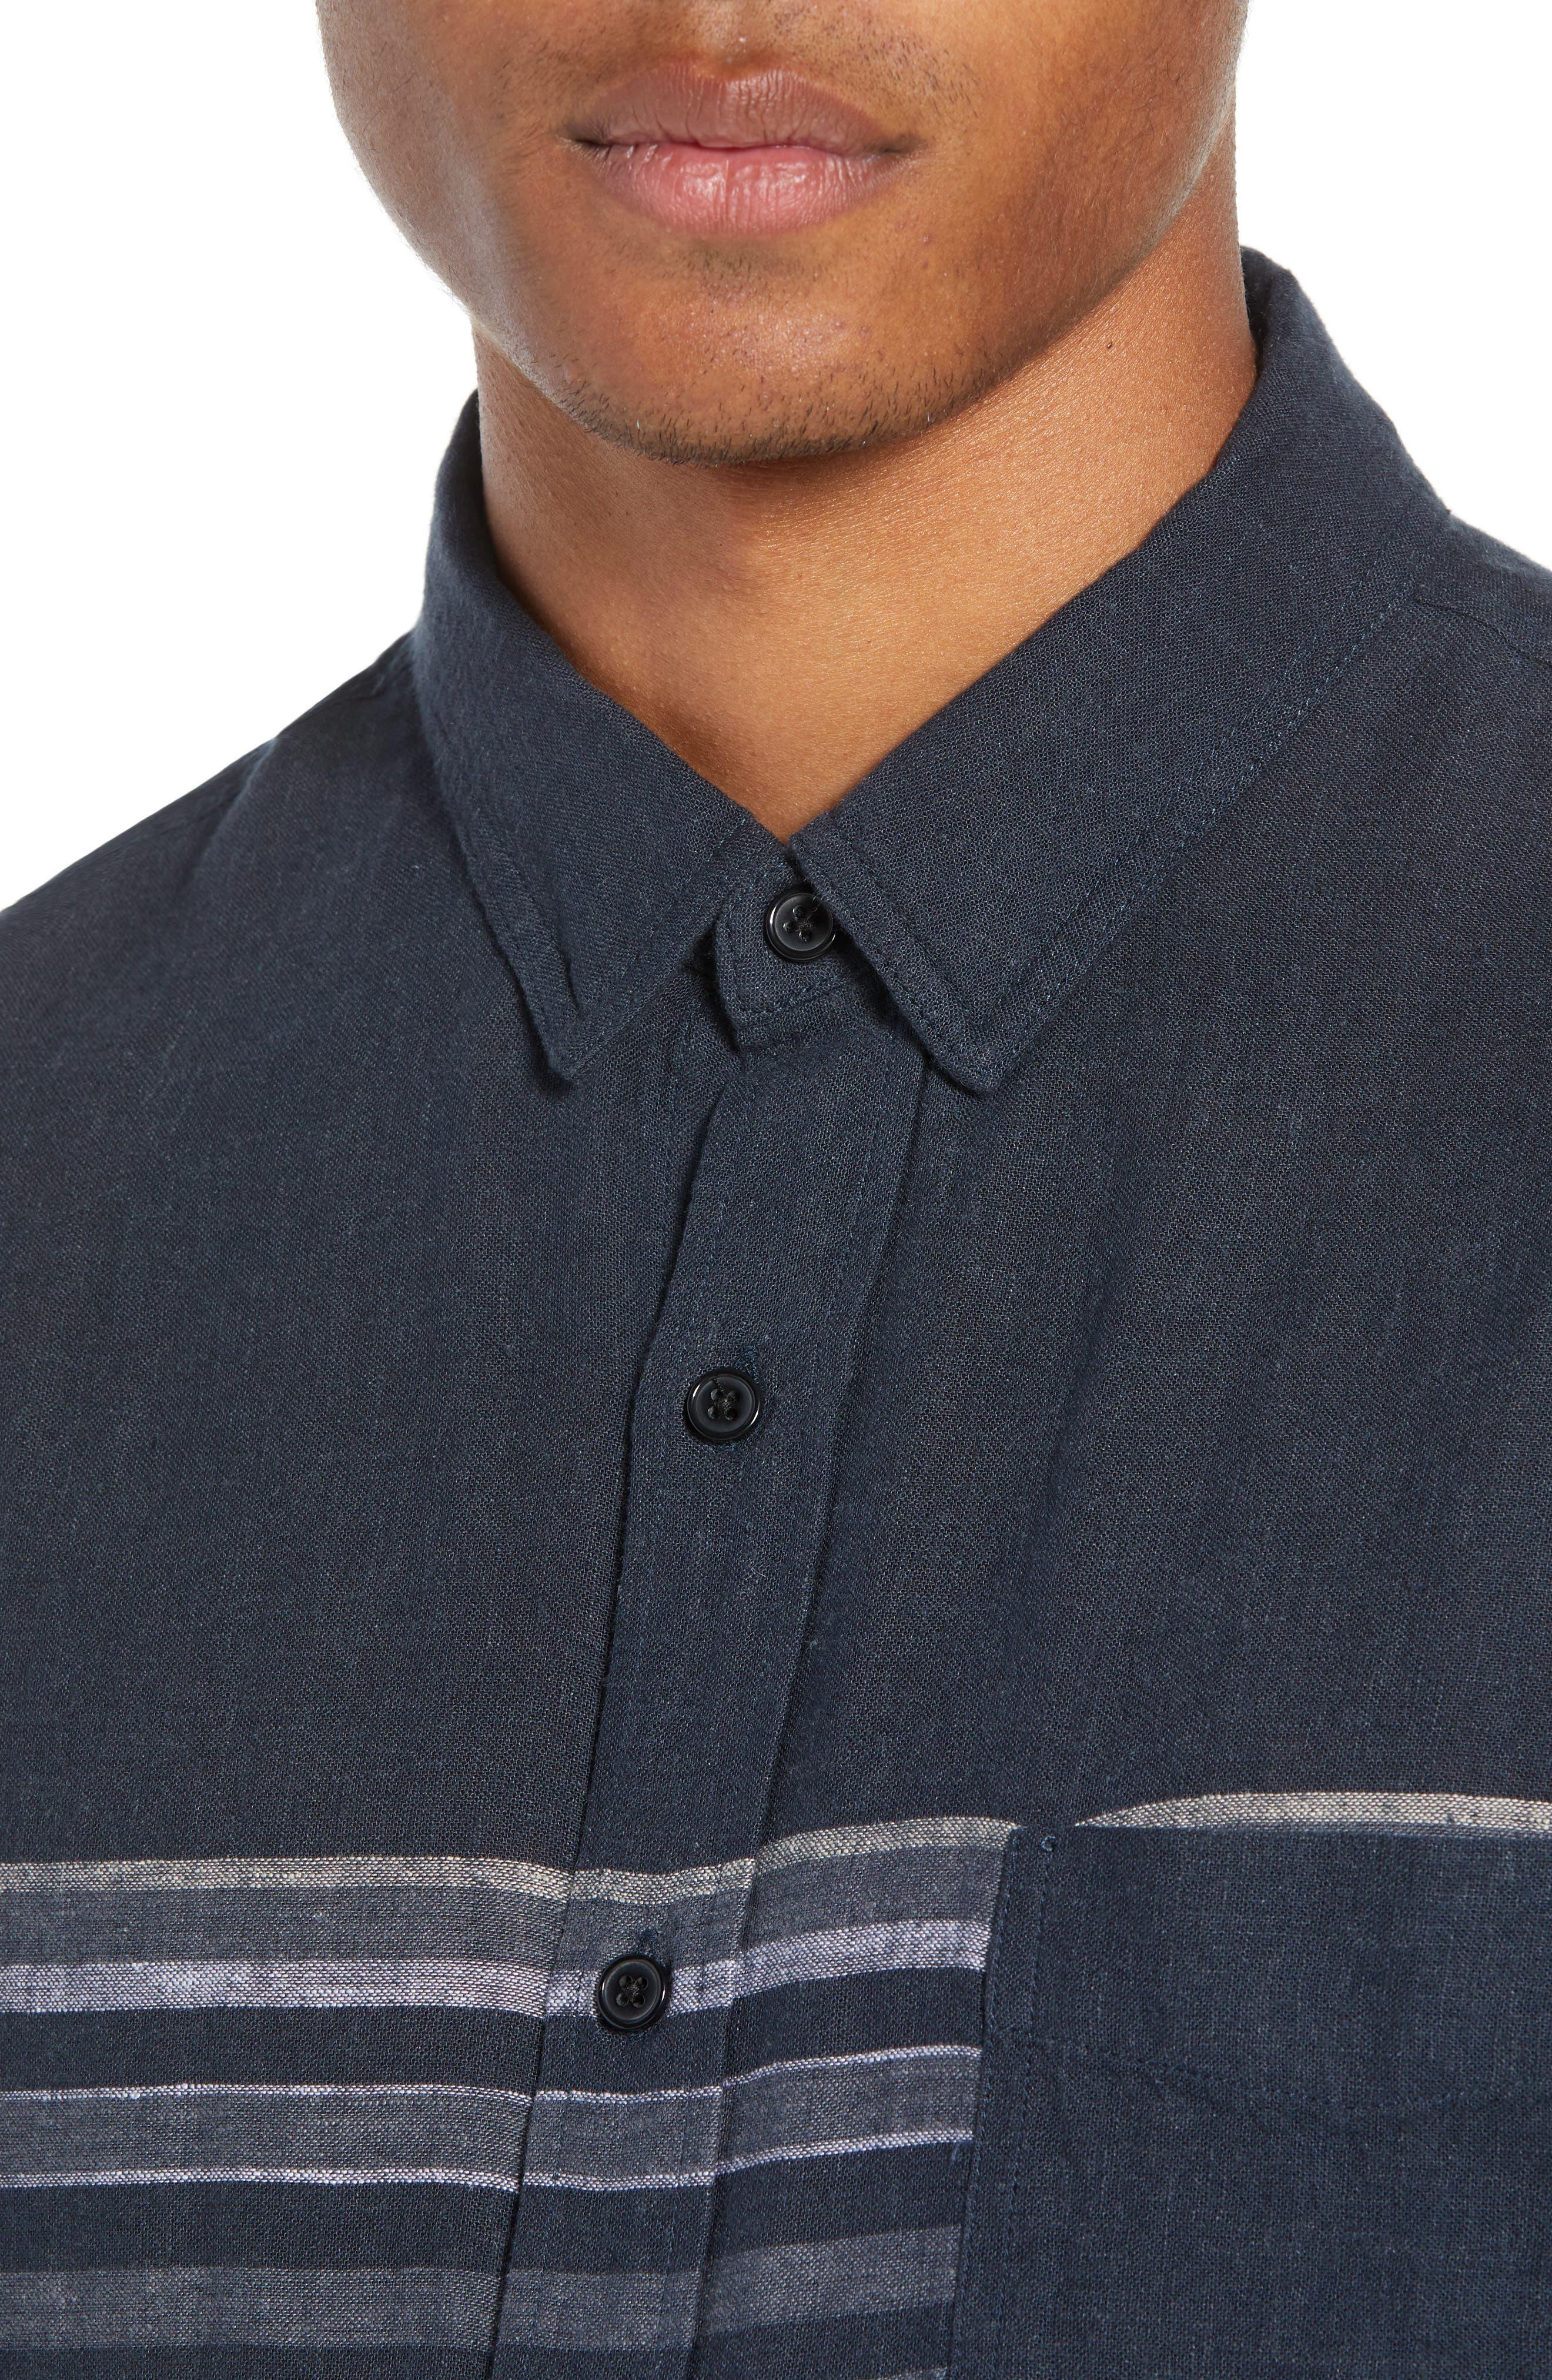 Carson Regular Fit Stripe Woven Shirt,                             Alternate thumbnail 2, color,                             NAVY/WHITE/GREY STRIPE